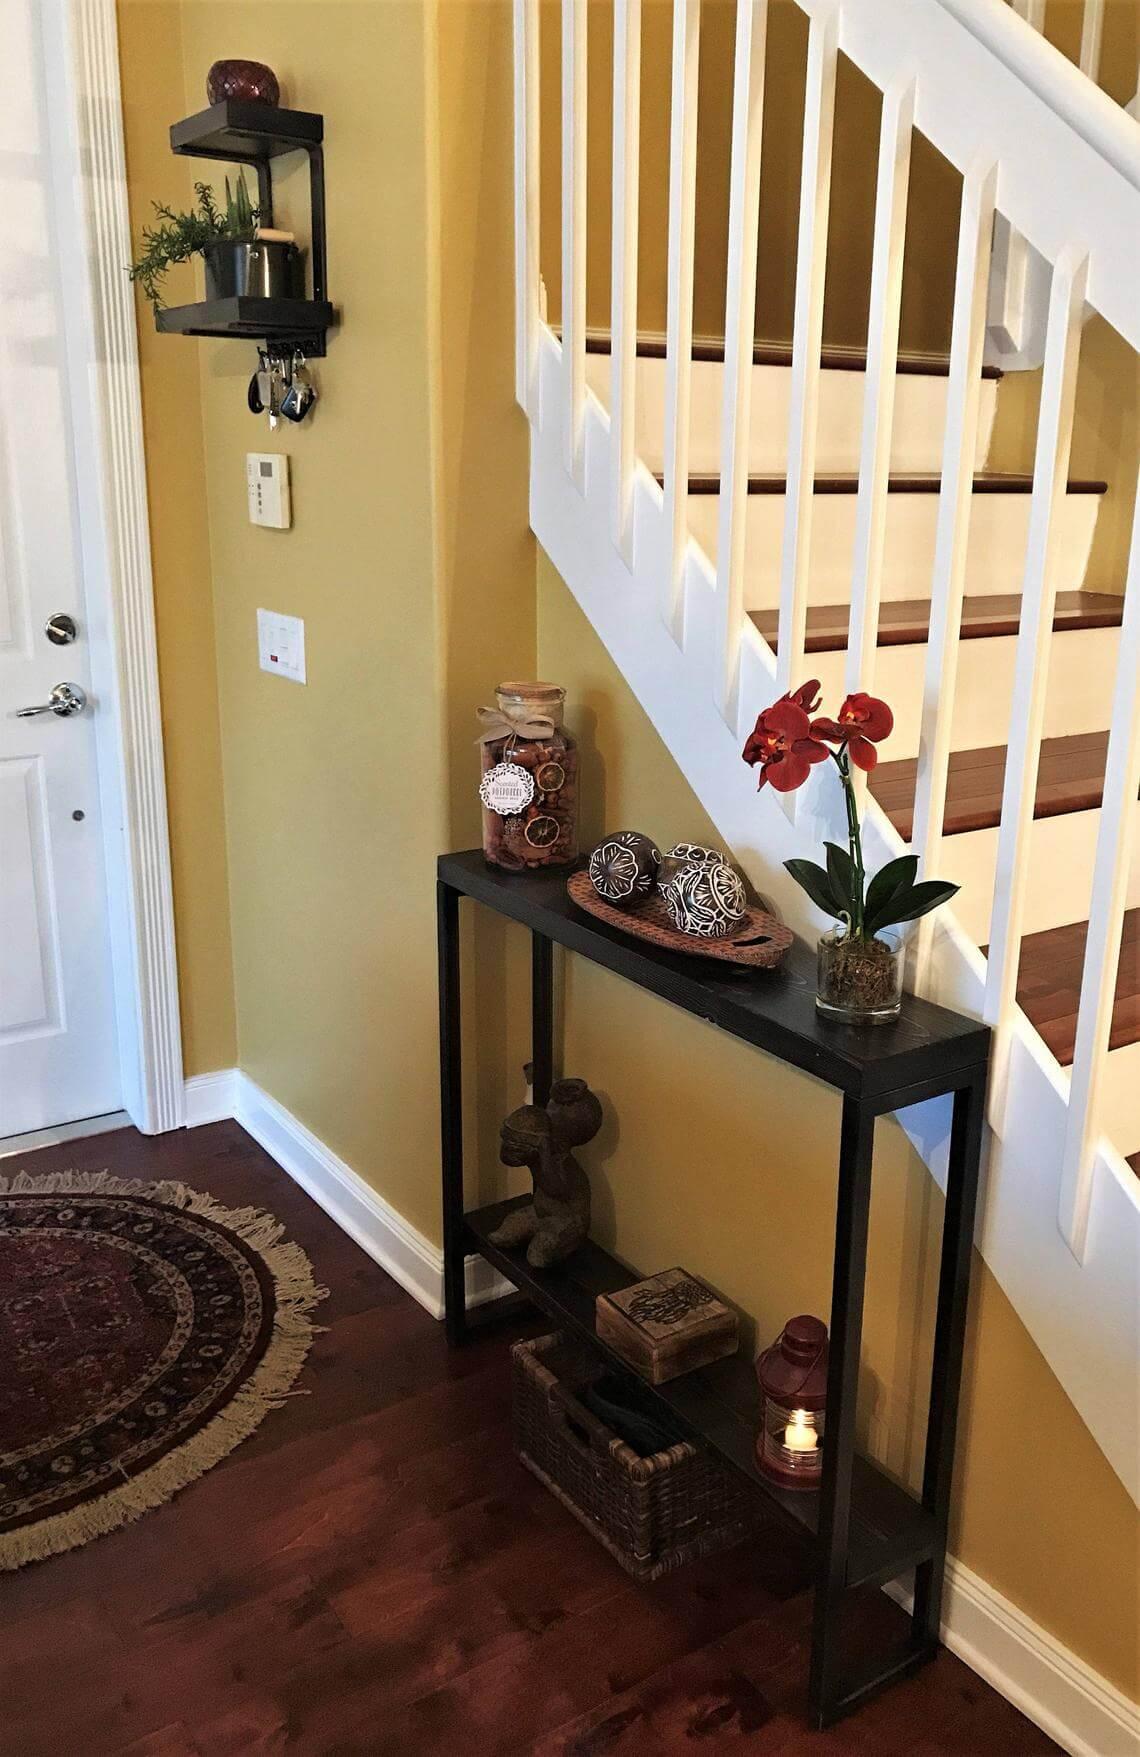 Slim Entry Way Table with Bottom Shelf